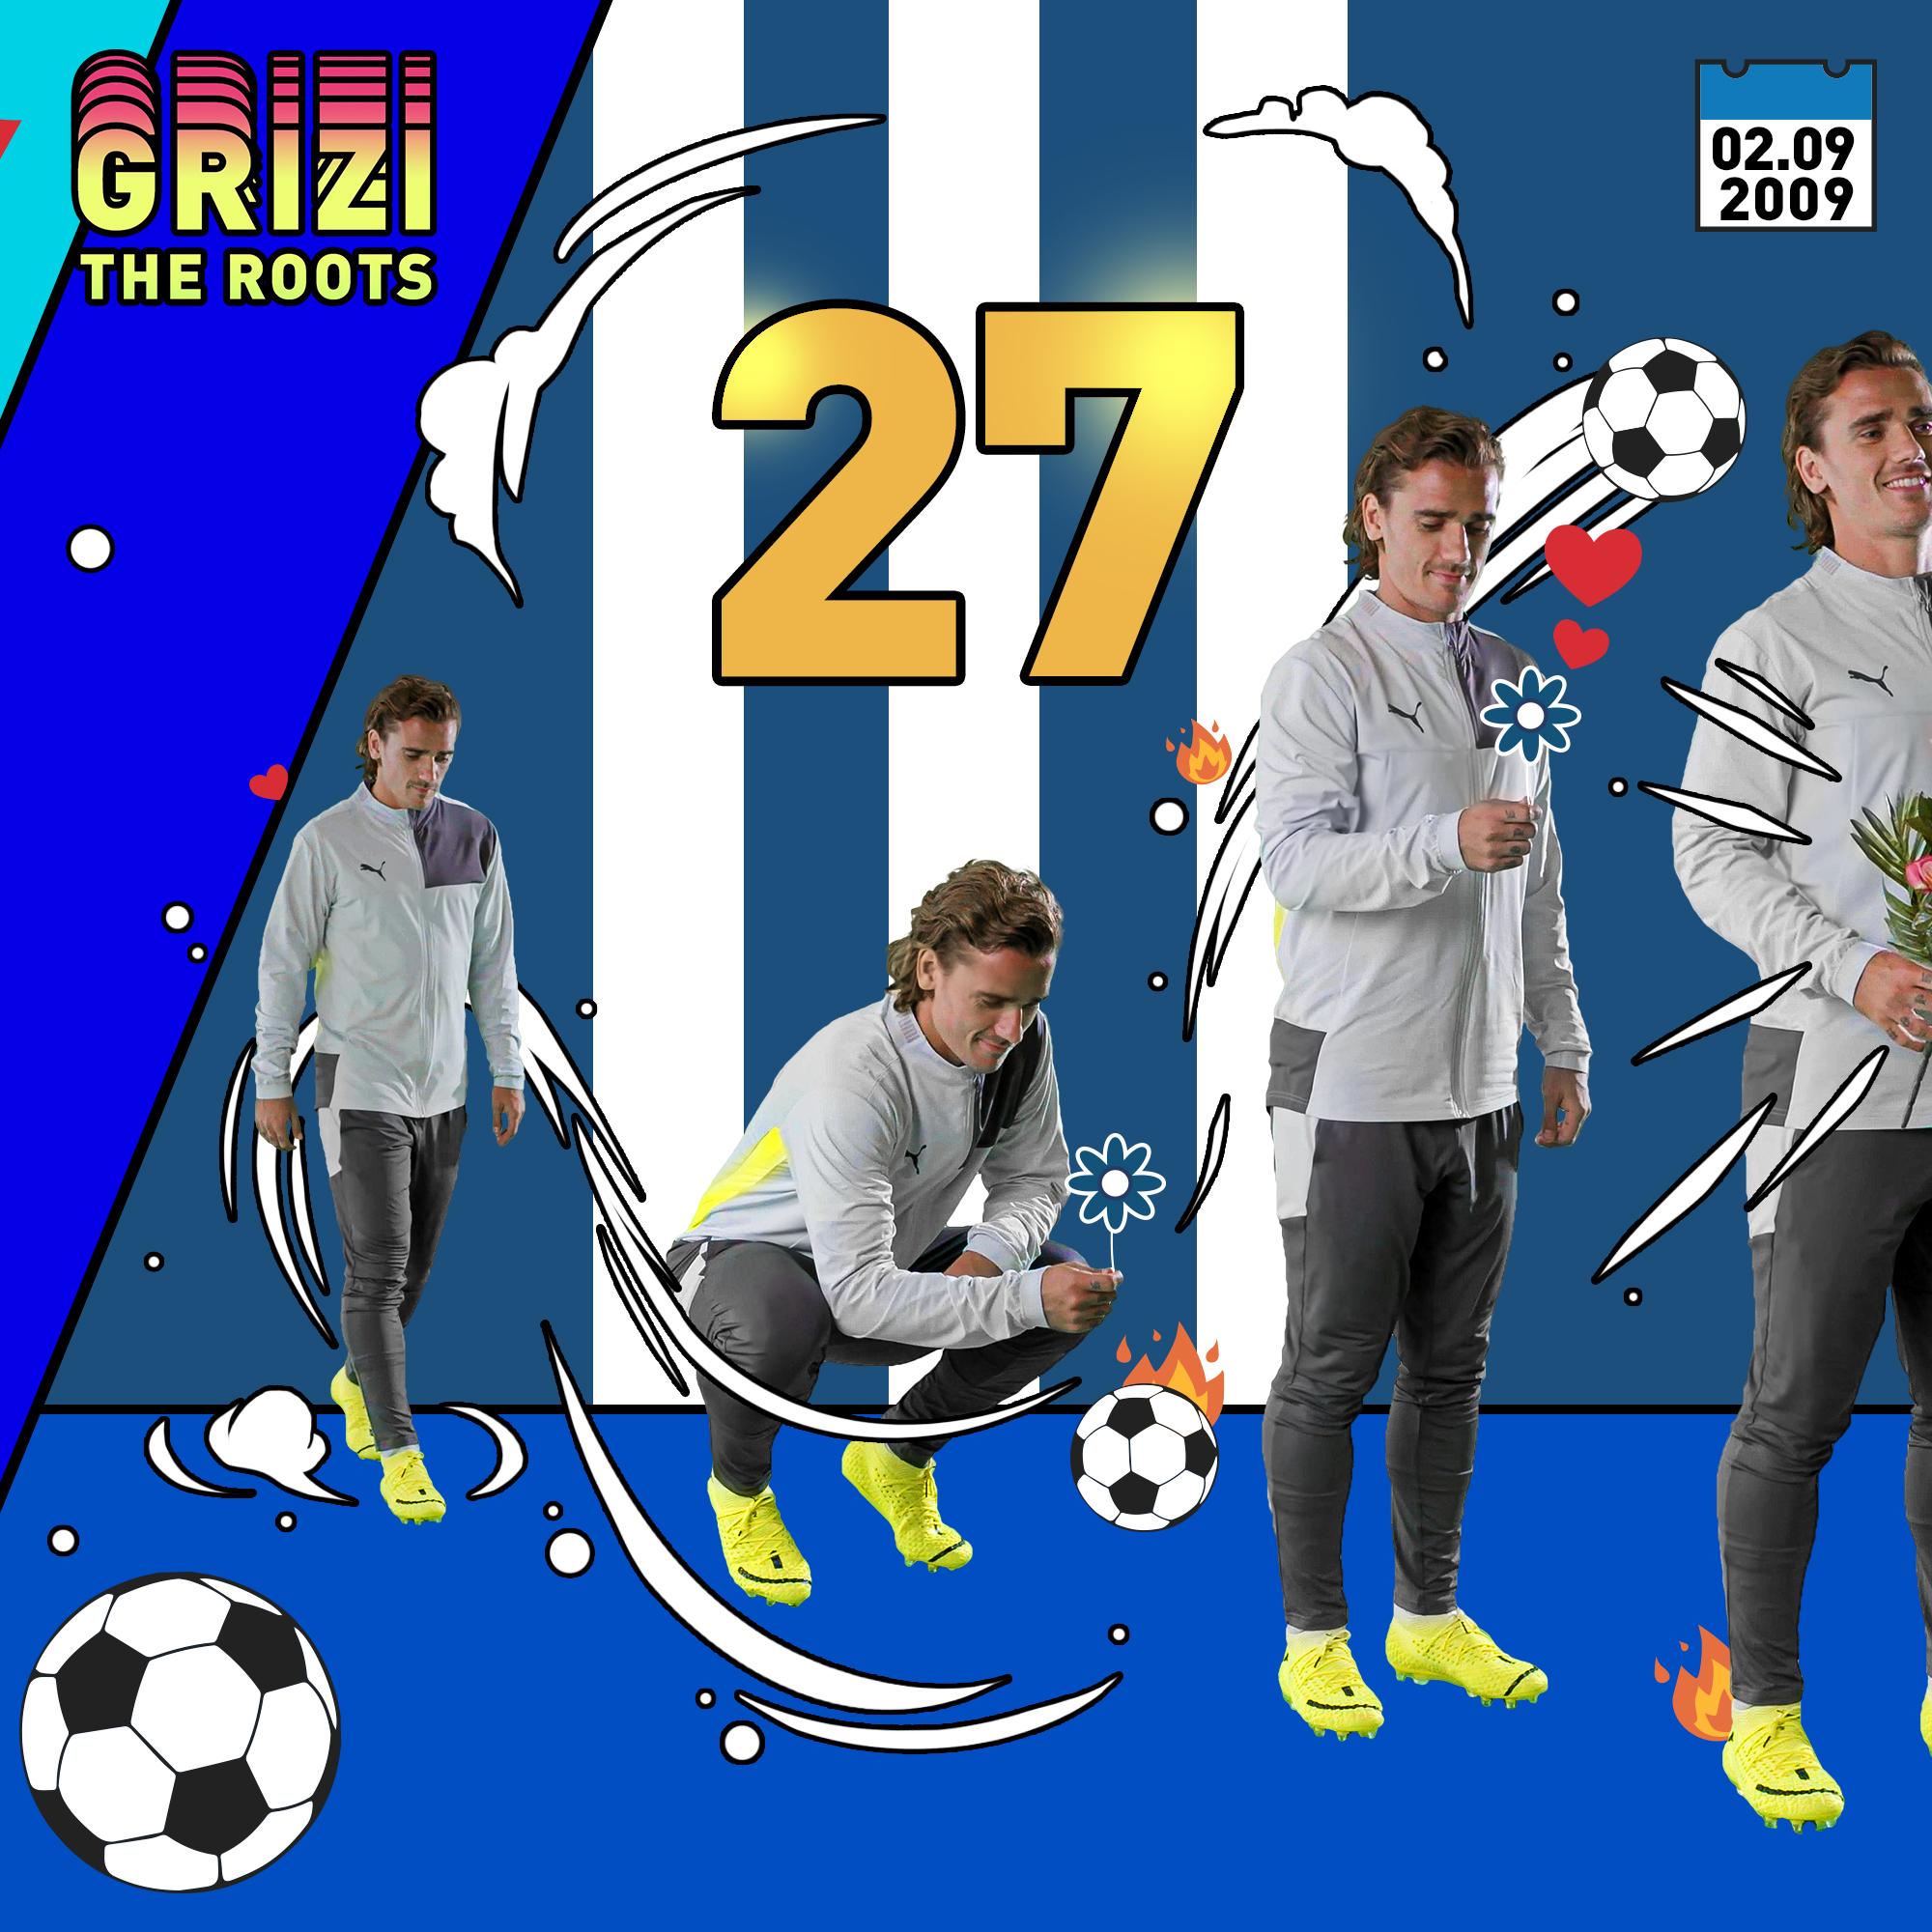 19AW_Social_IG_TS_Football_Griezmann-Special-Edition_FUTURE_Q4_2000x2000_002.jpg